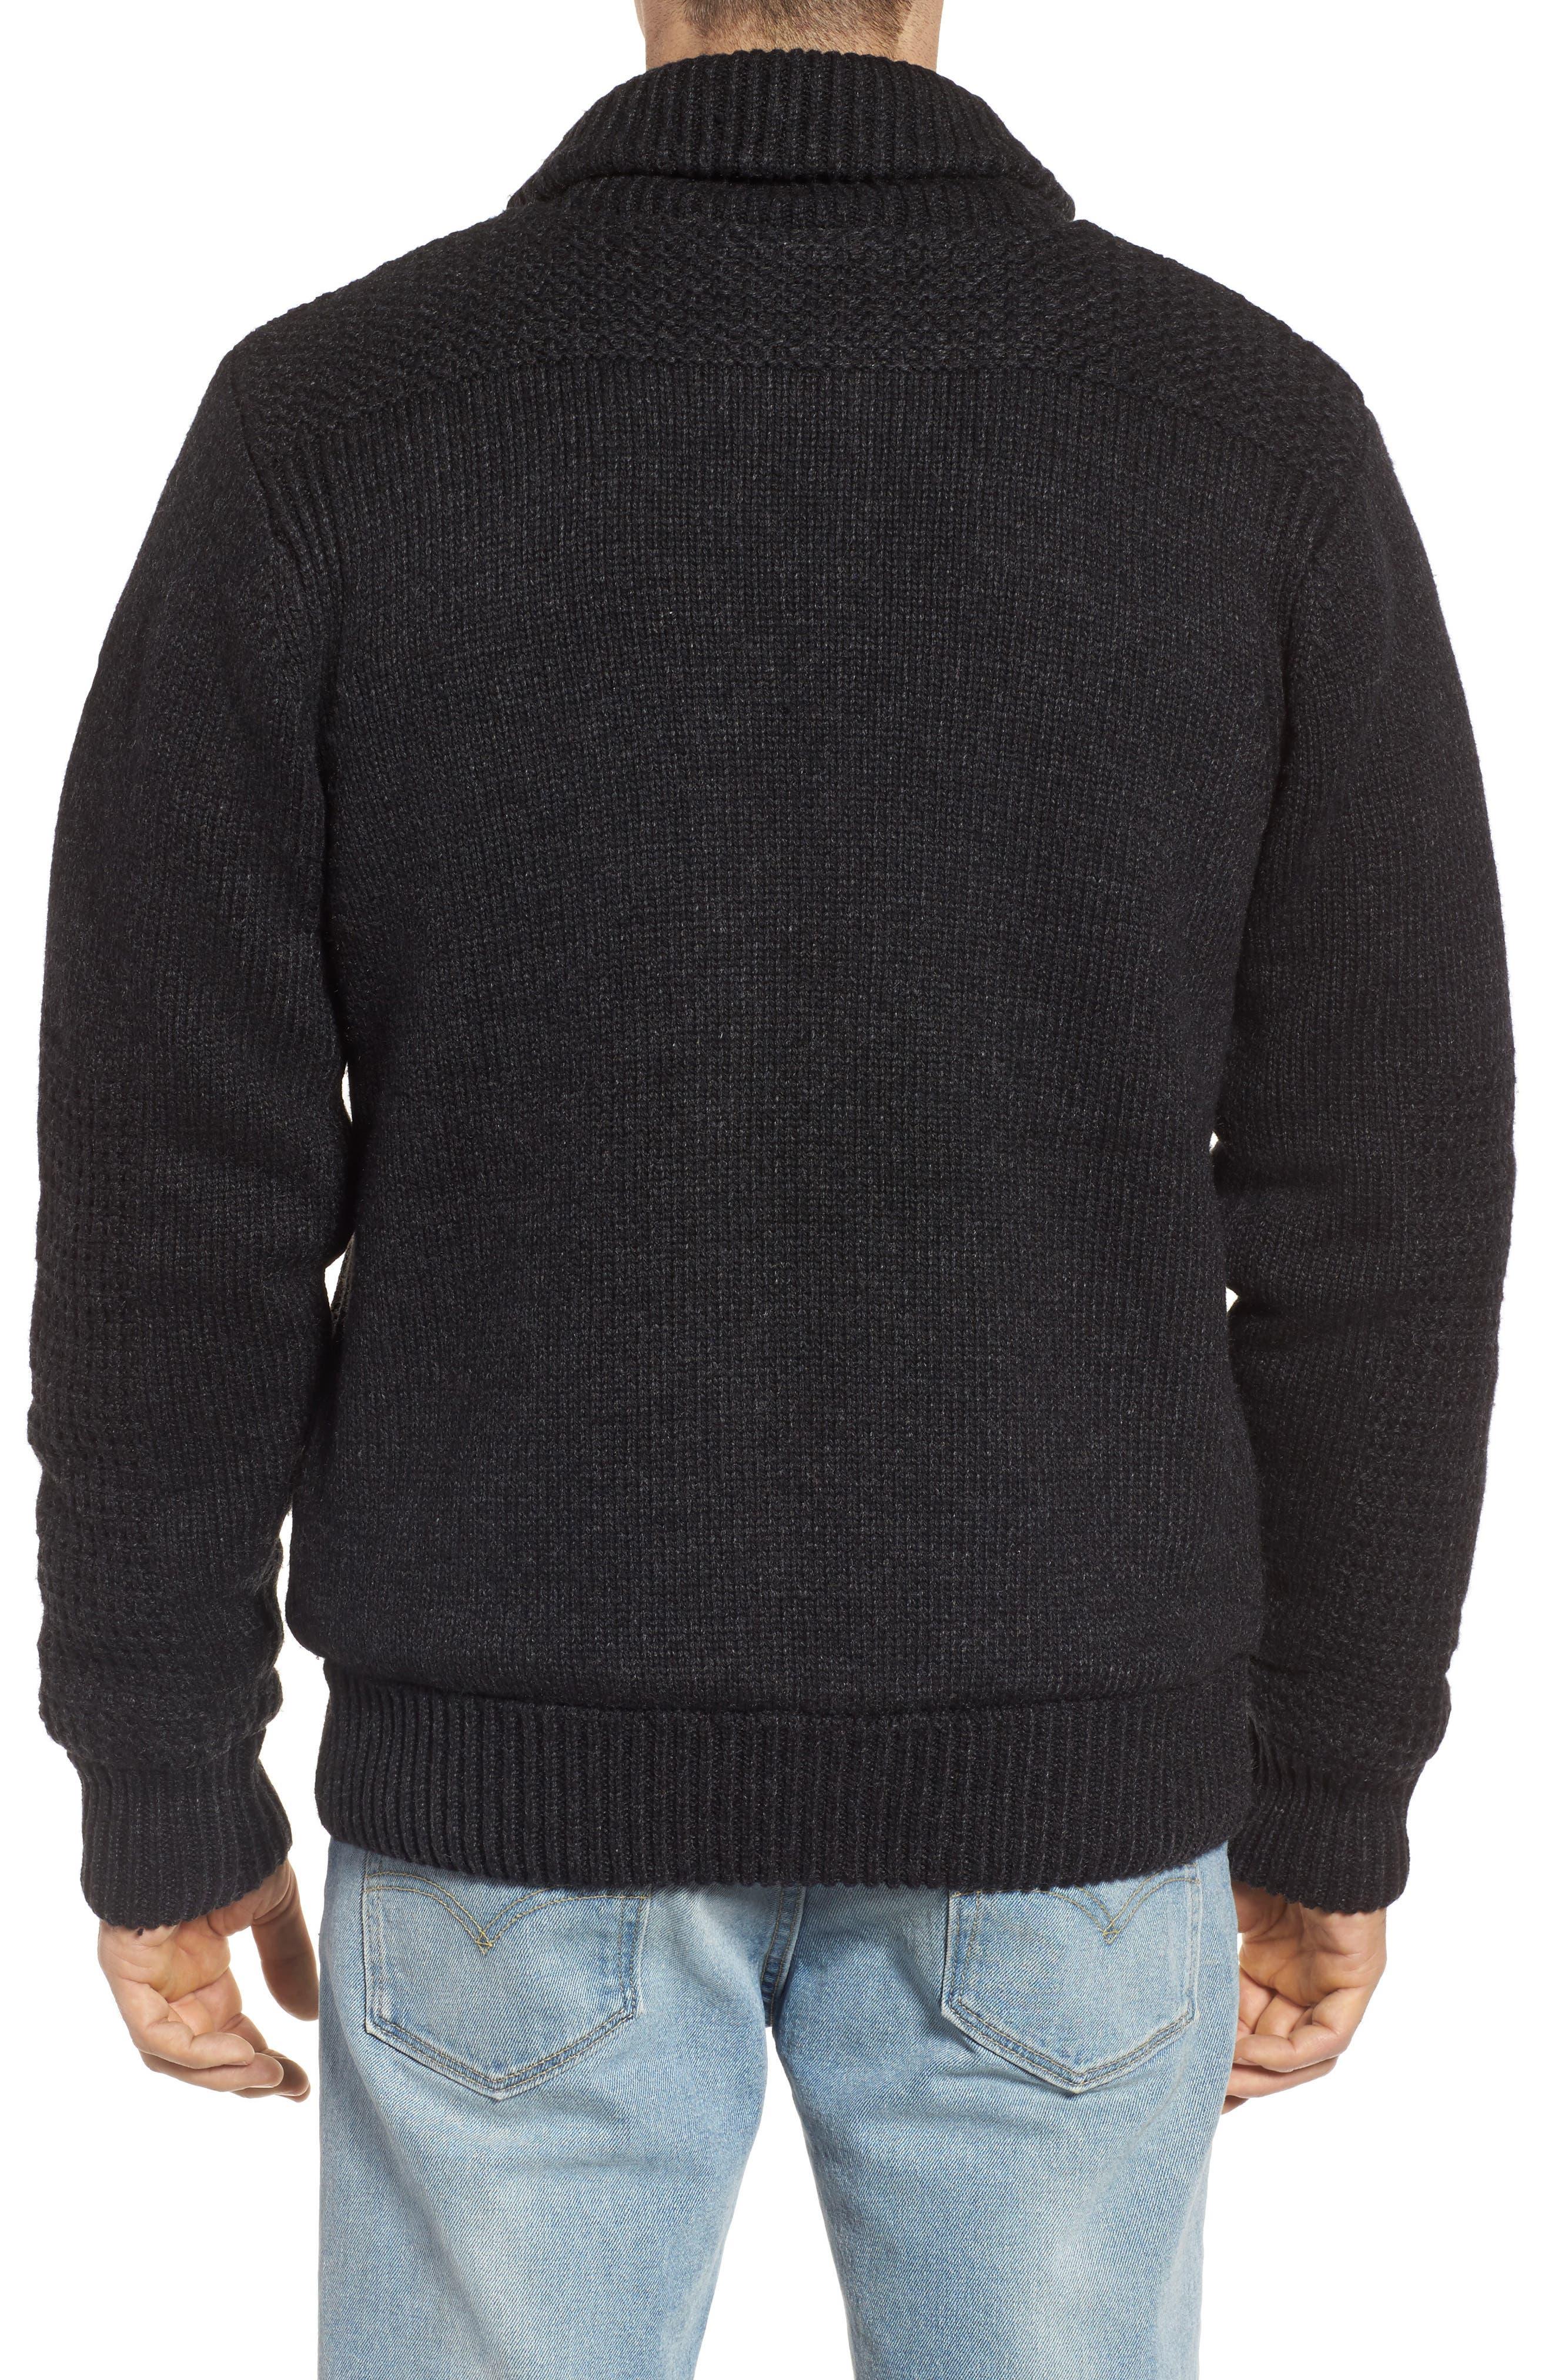 SCHOTT NYC,                             Lined Wool Zip Sweater,                             Alternate thumbnail 2, color,                             BLACK